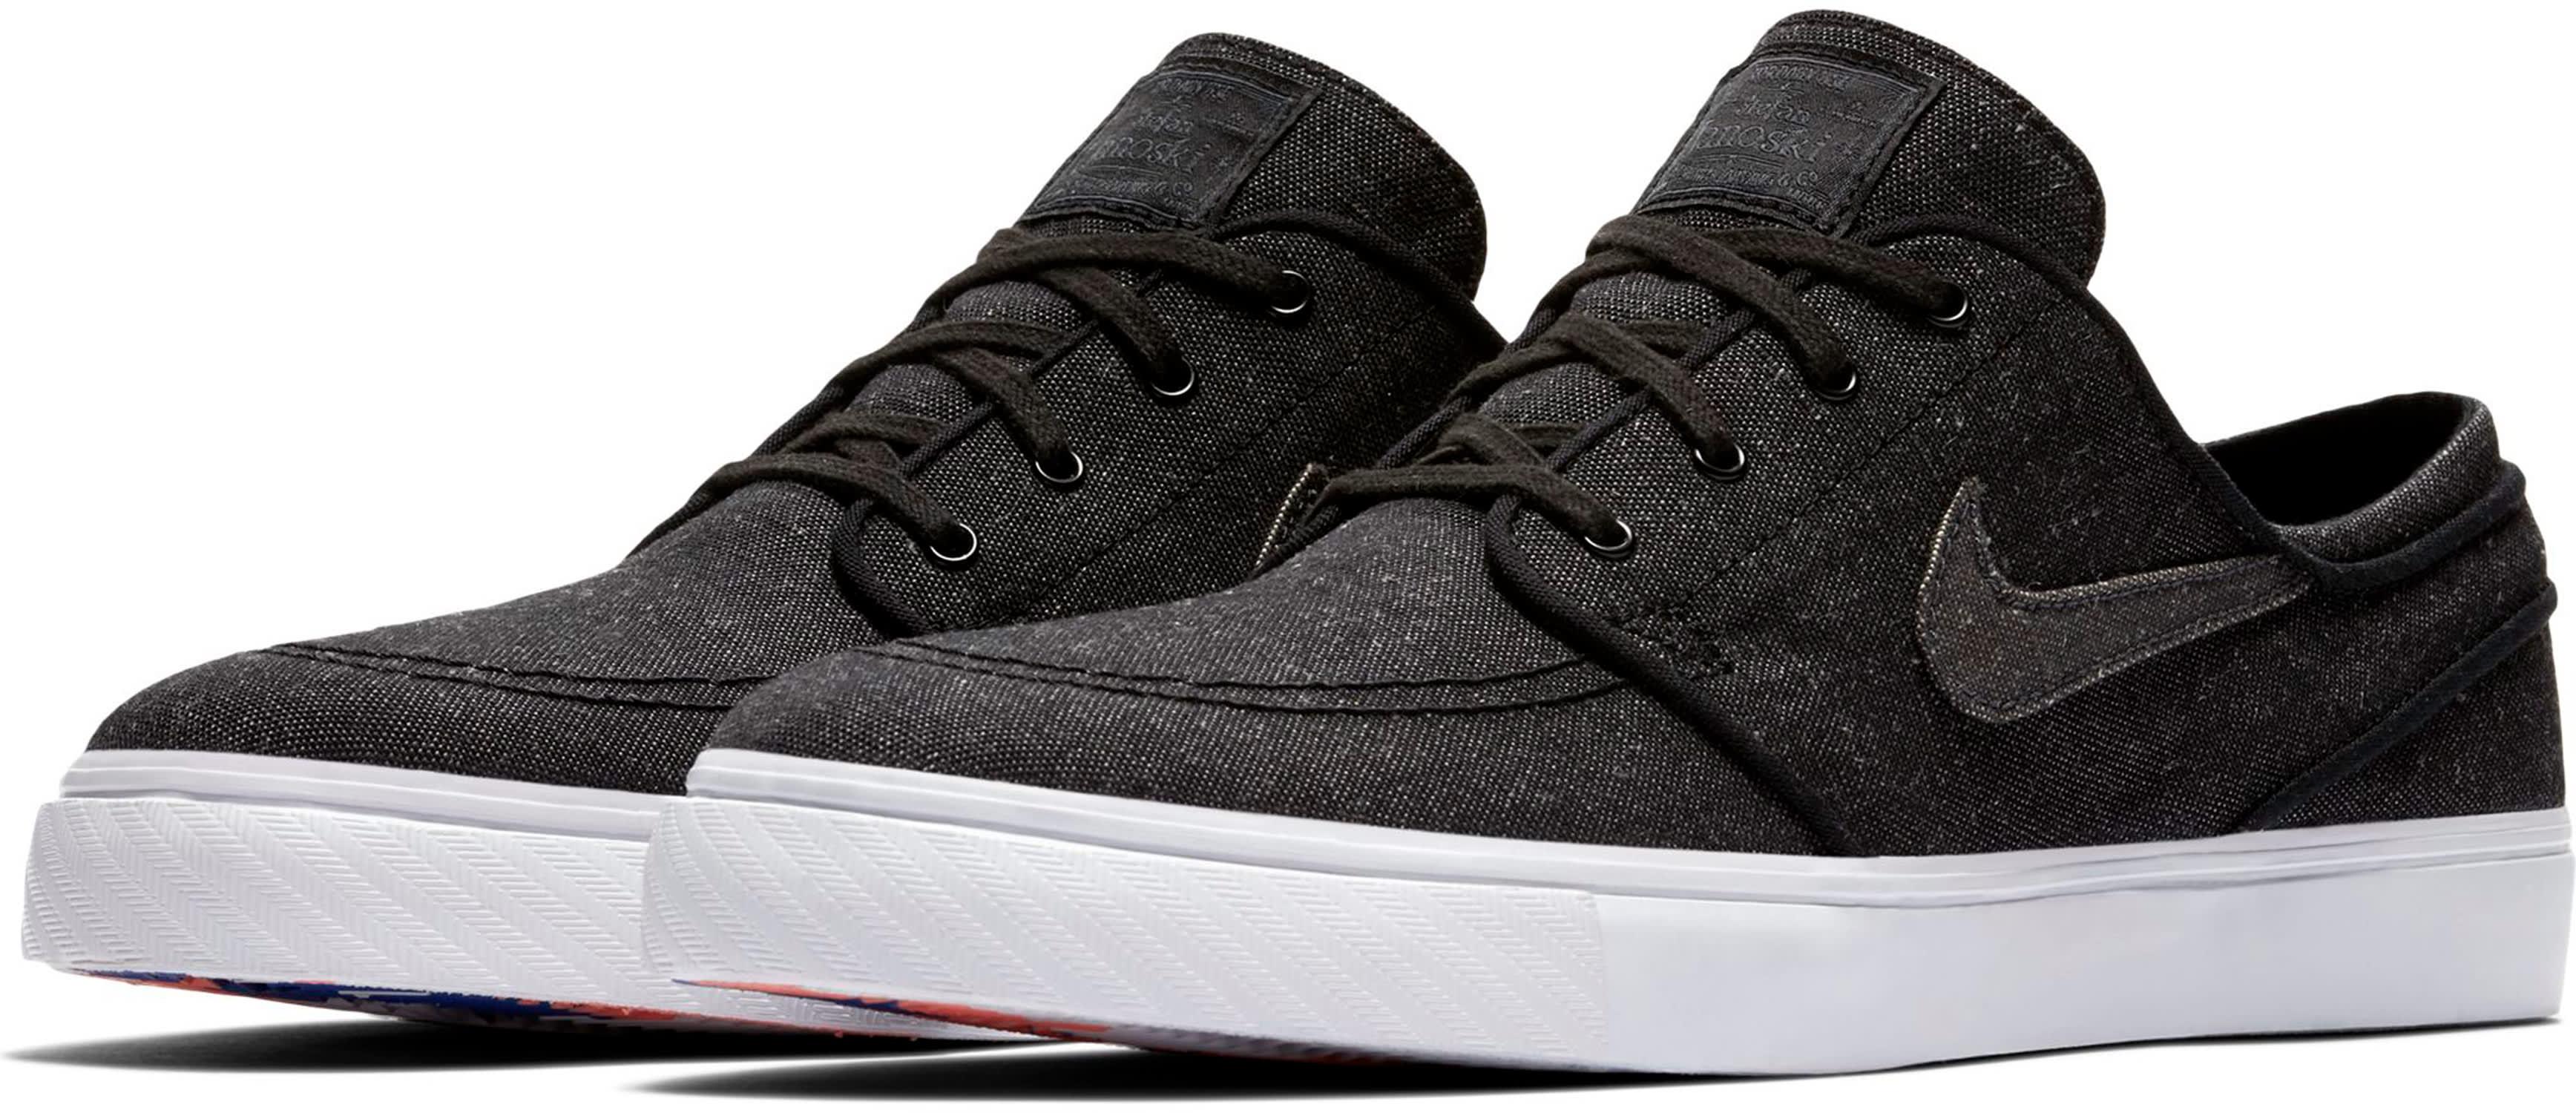 buy online 26ca3 3ef22 Nike SB Zoom Stefan Janoski Canvas Deconstructed Skate Shoes - thumbnail 3